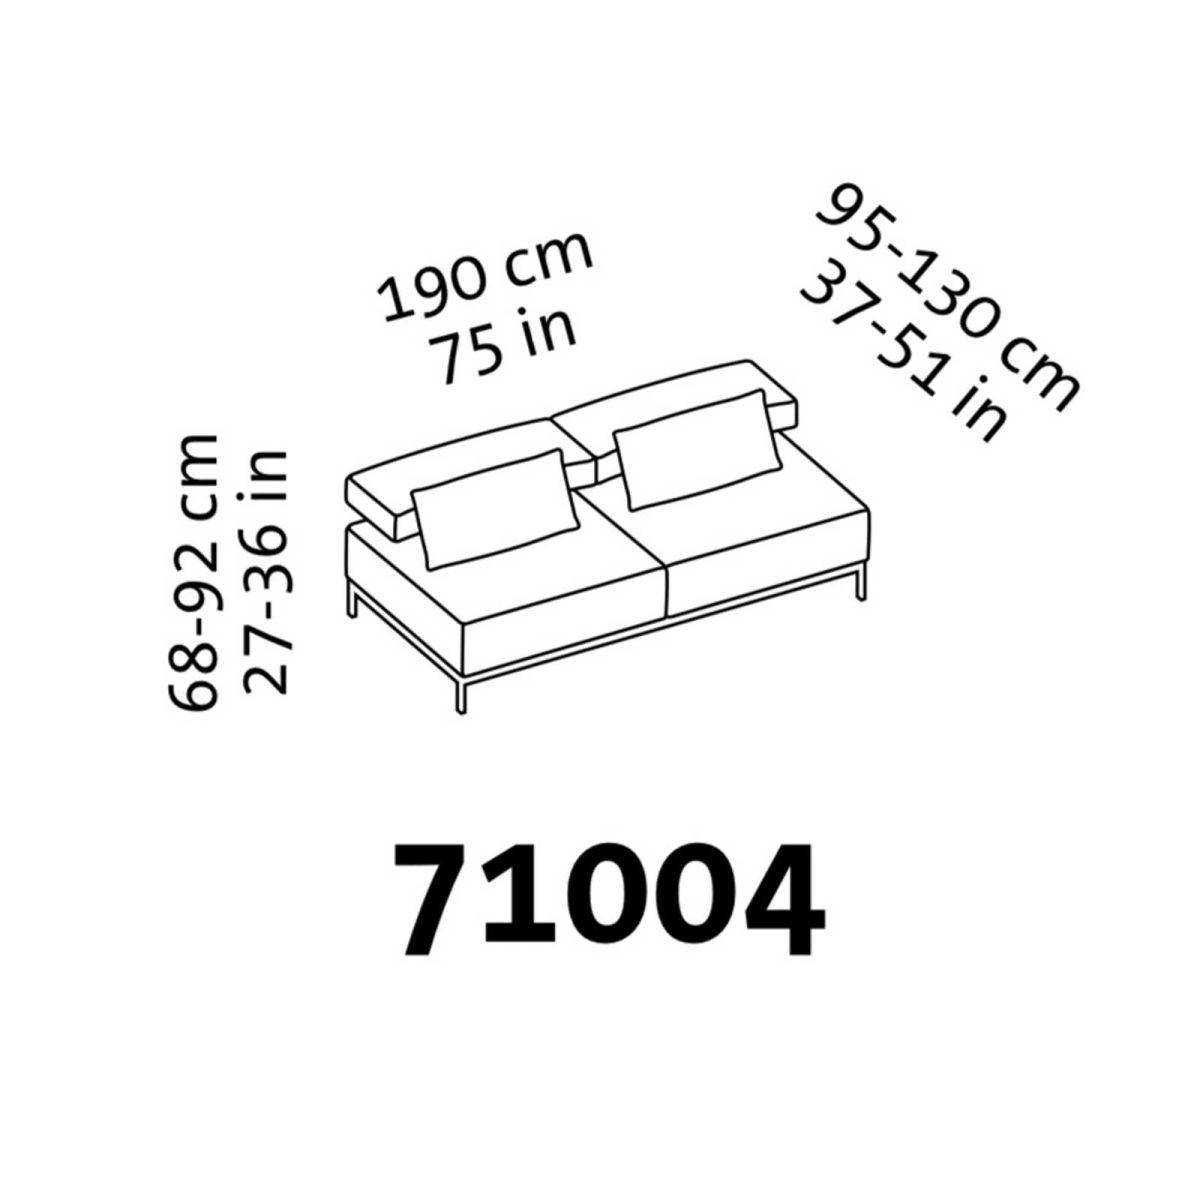 71004